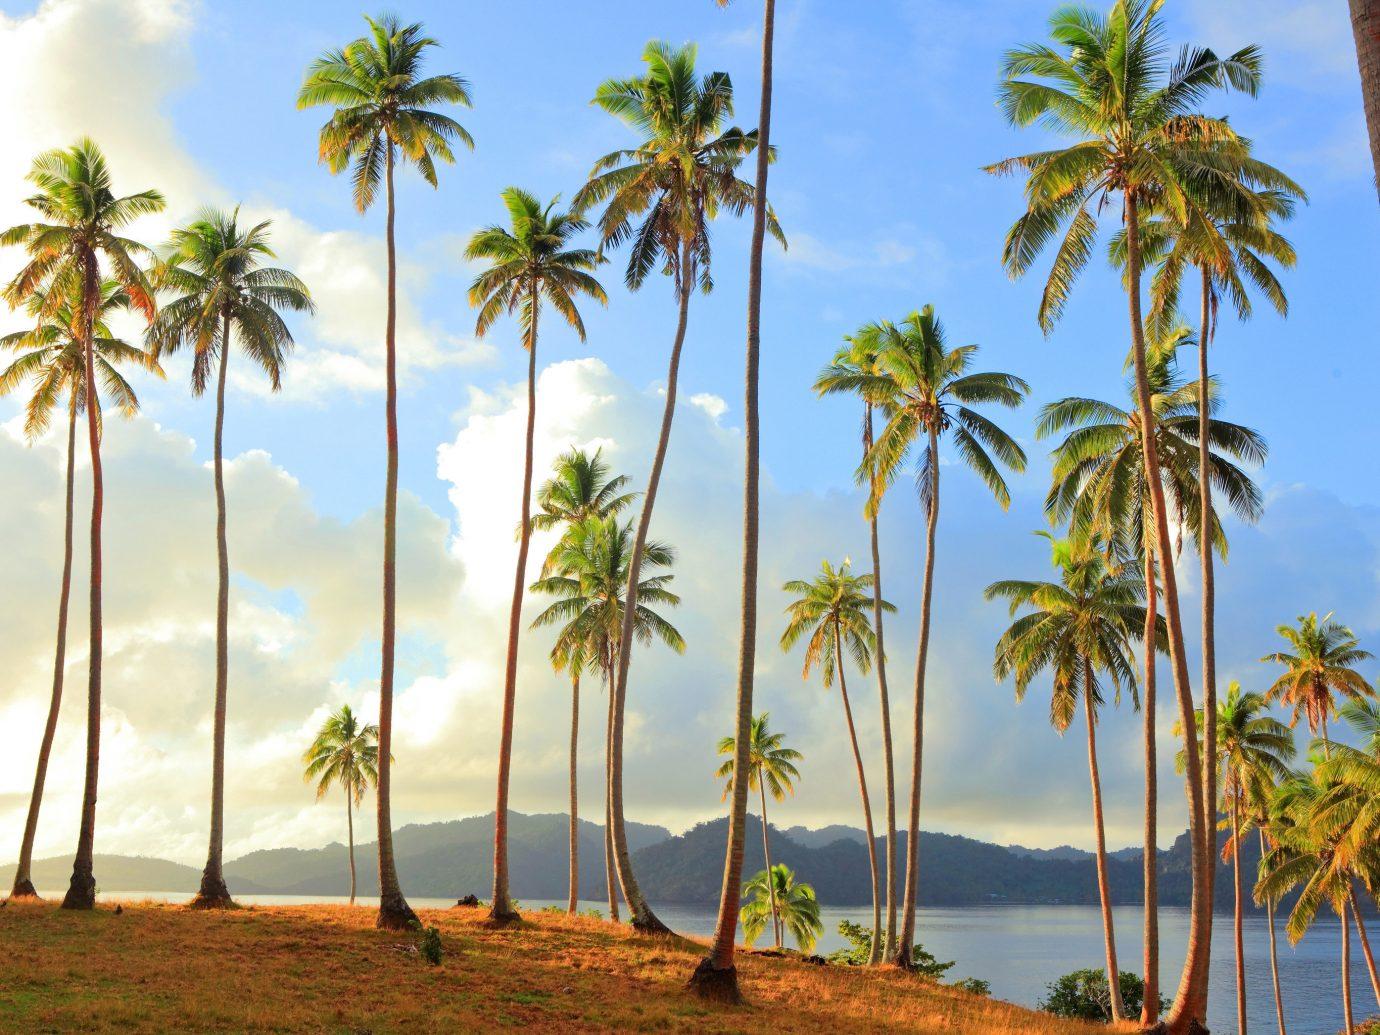 Islands Trip Ideas palm sky tree outdoor Beach water palm family vegetation plant tropics Ocean caribbean botany arecales land plant woody plant vacation Coast lined borassus flabellifer Sea flowering plant Jungle Island savanna sandy shade